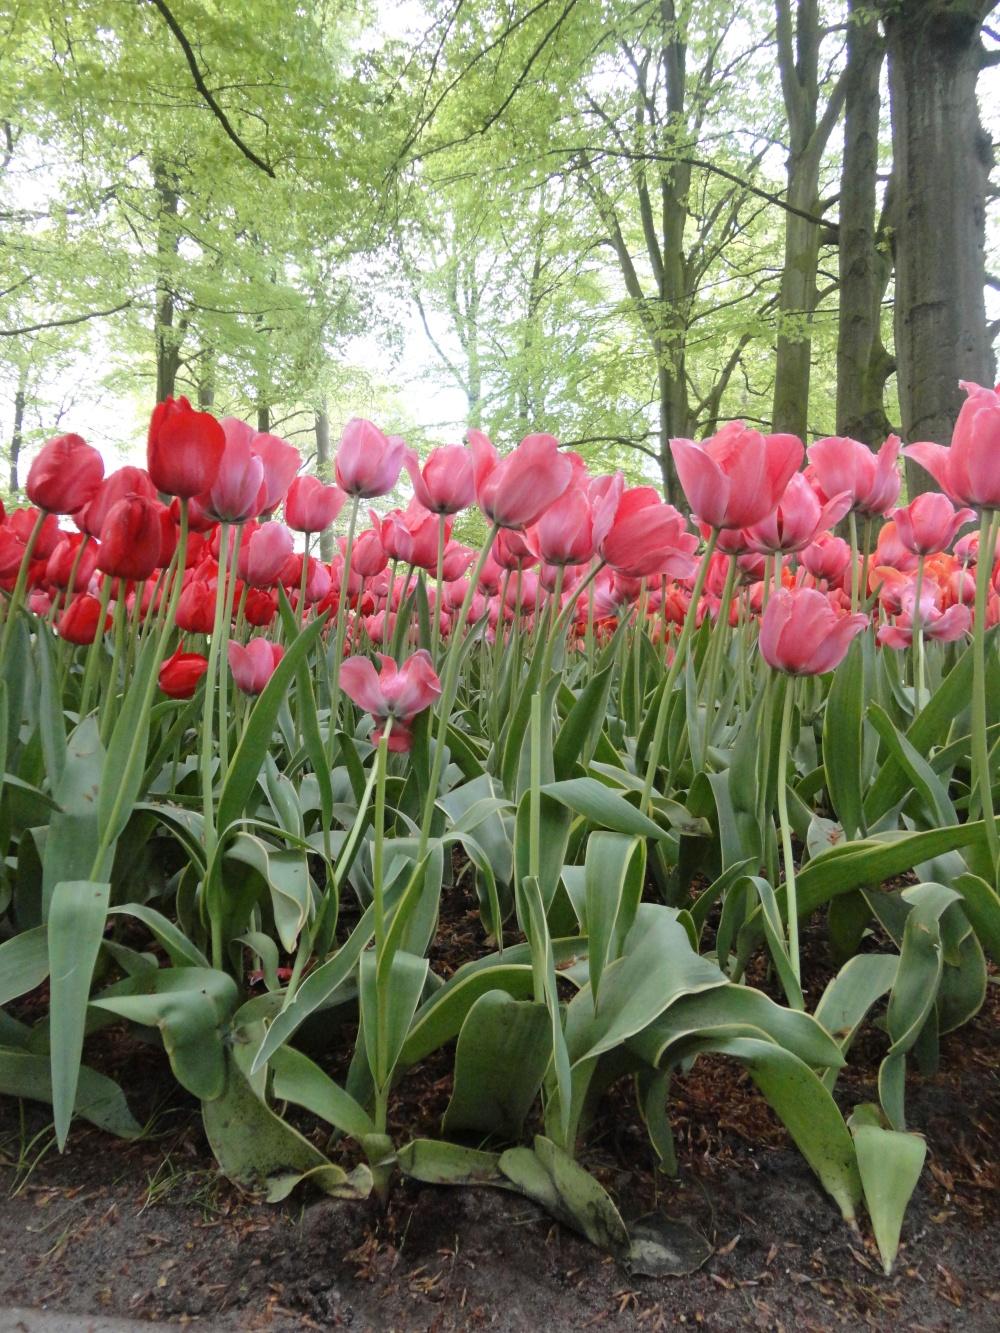 Keukenhof - Tulipes aux longues tiges